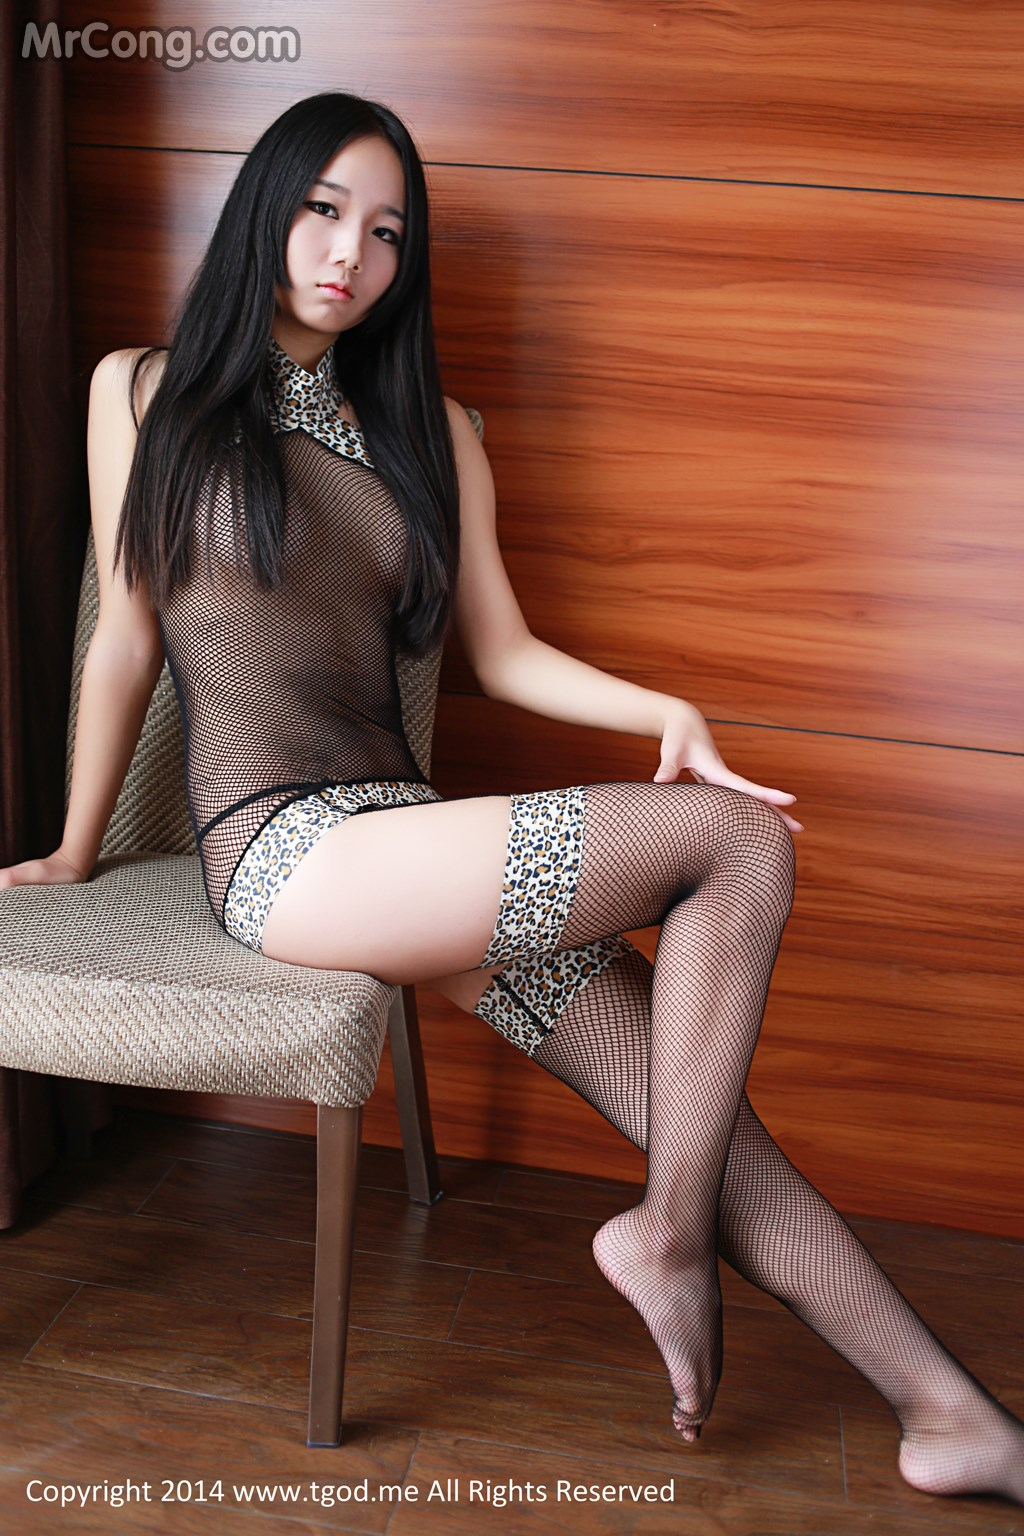 TGOD 2014-12-05: Model 爱吃鱼的悠悠 (52P)